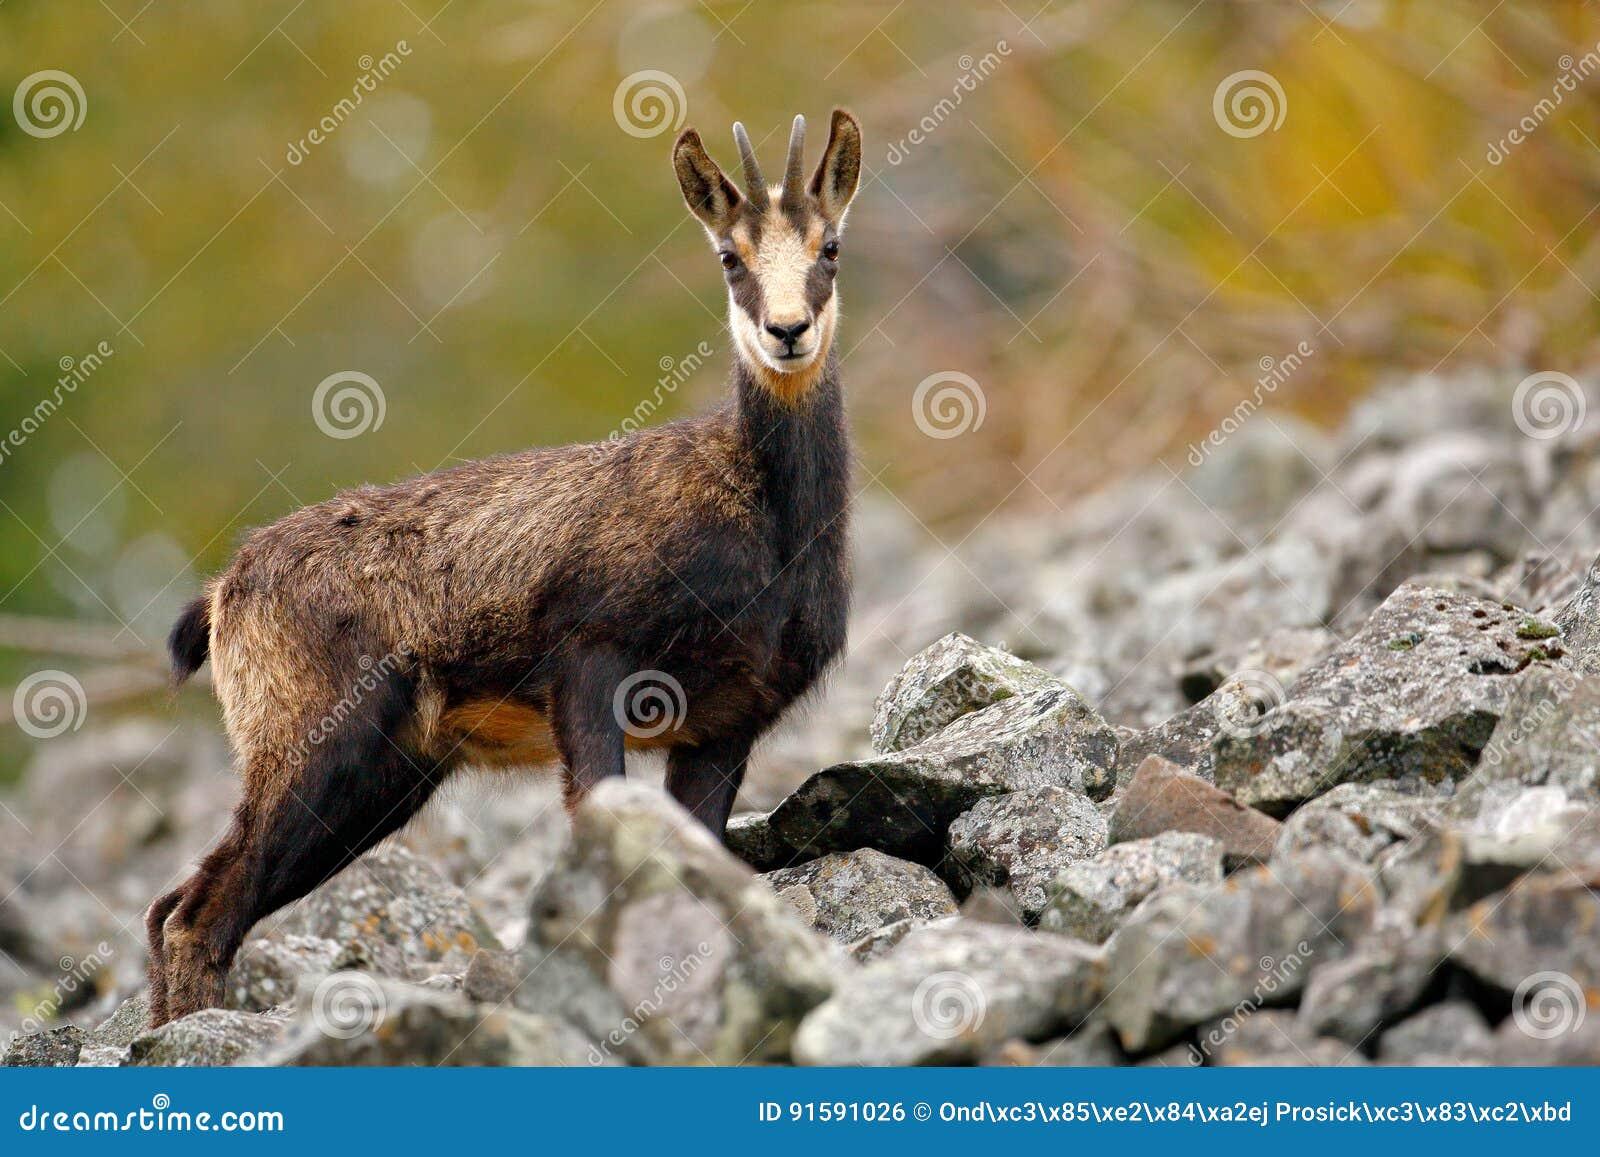 Chamois, Rupicapra rupicapra, in the green grass, grey rock in background, Gran Paradiso, Italy. Animal in the Alp. Wildlife scene